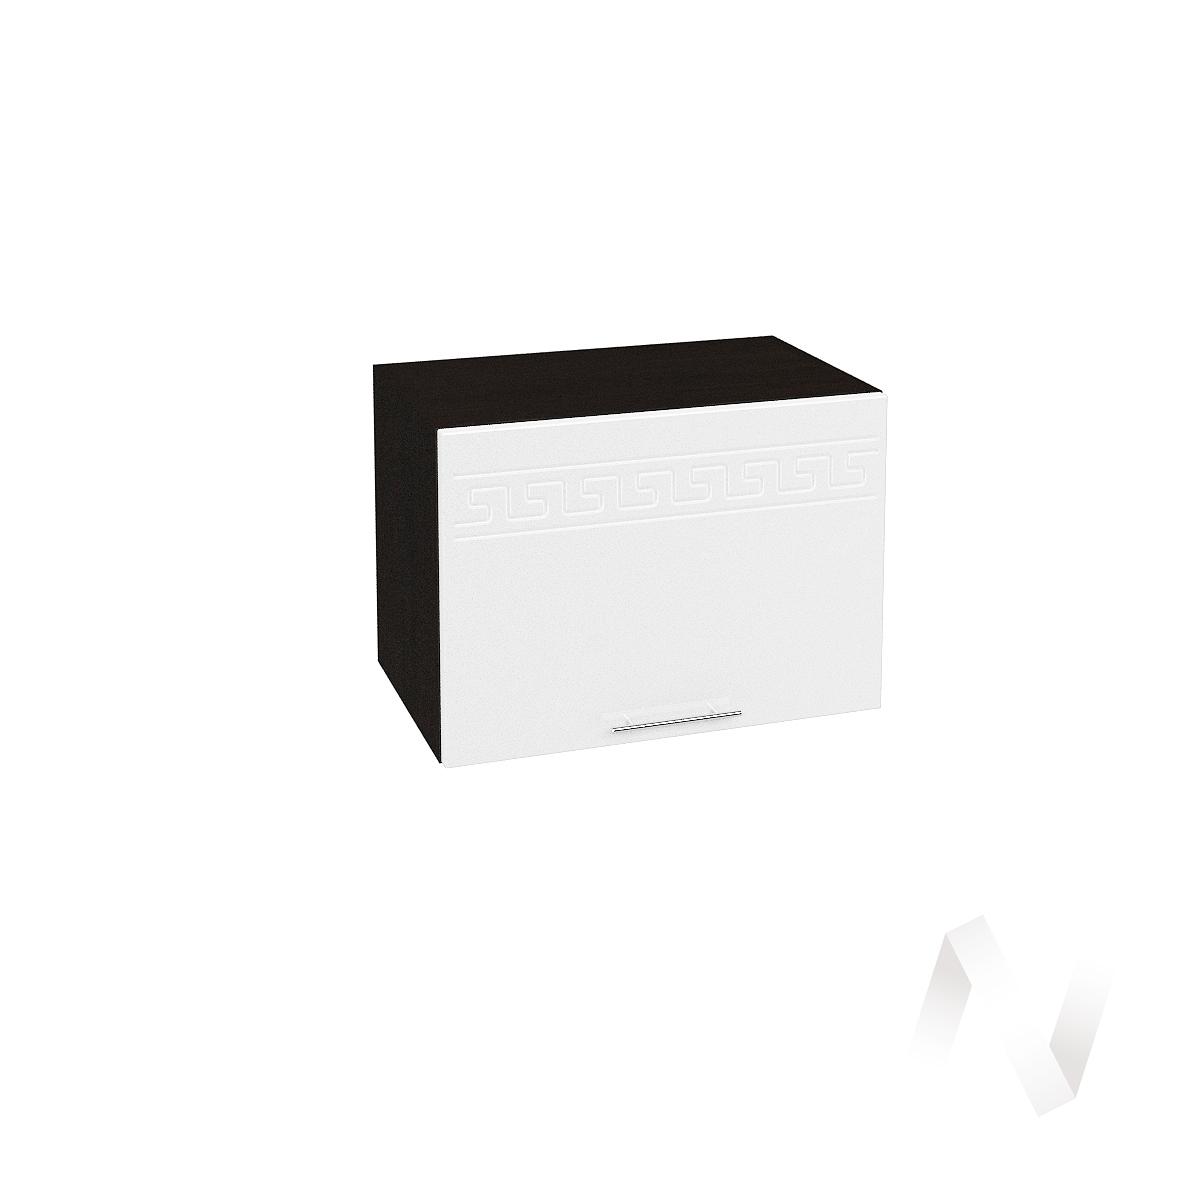 "Кухня ""Греция"": Шкаф верхний горизонтальный 500, ШВГ 500 (белый металлик/корпус венге)"